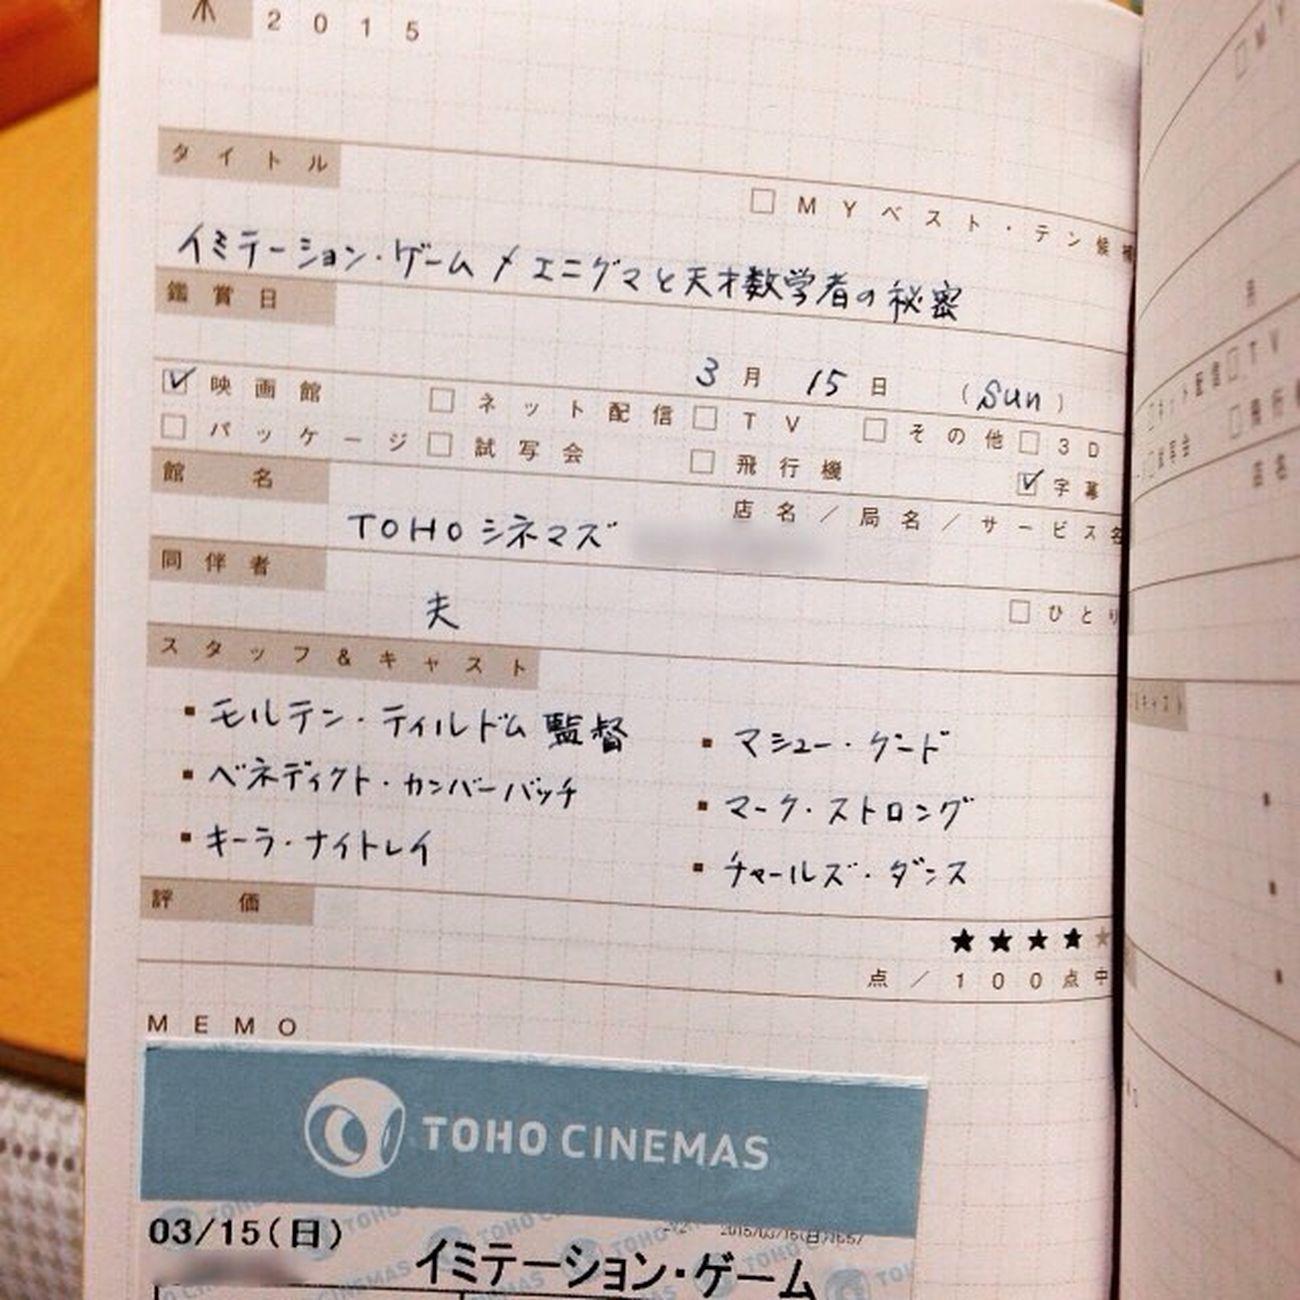 MOVIE Cinema Diary Note 日記 記録 映画鑑賞 キネノート Kinenote